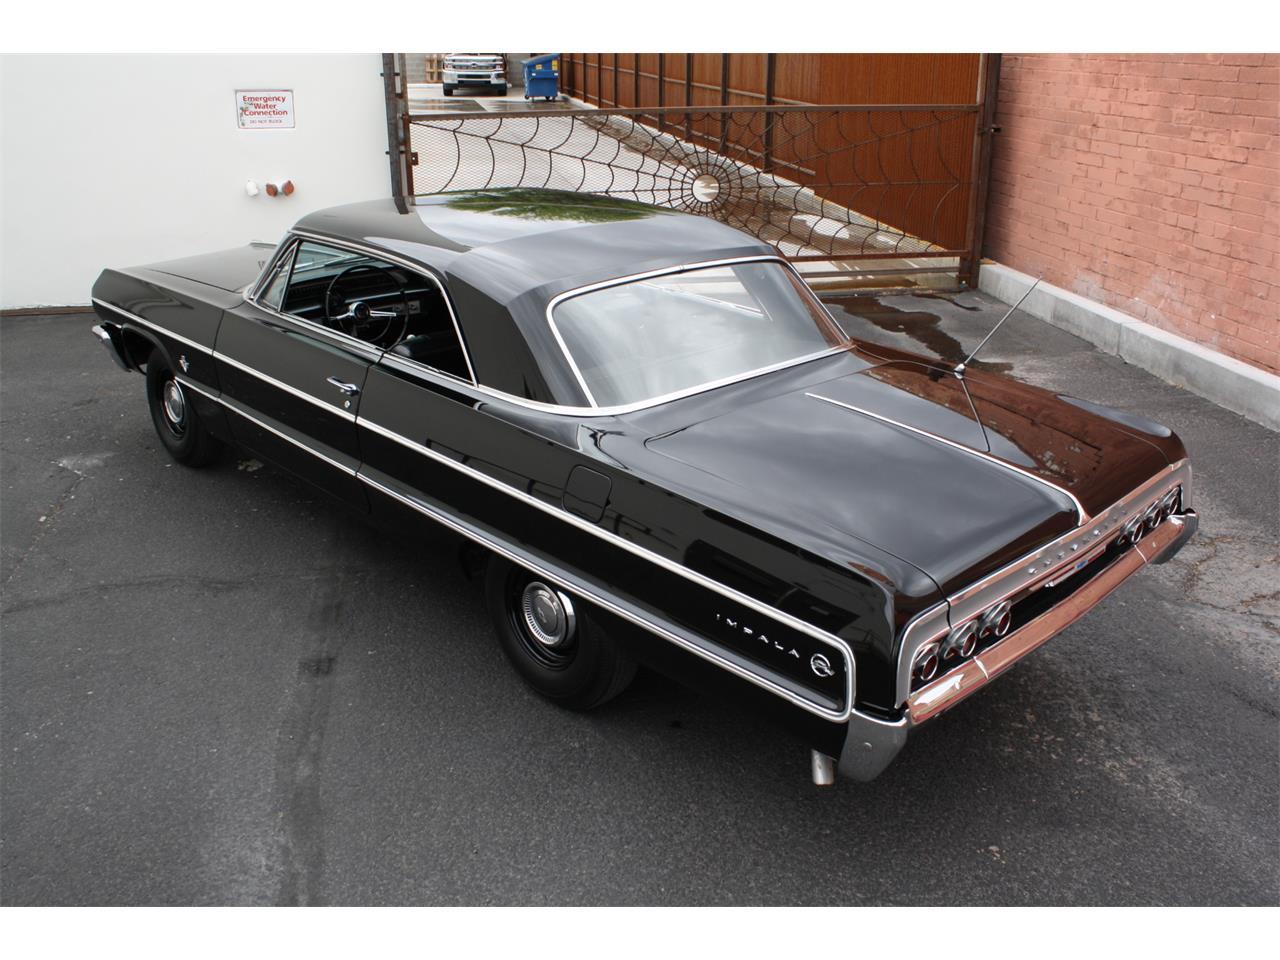 1964 Chevrolet Impala (CC-1220258) for sale in Tucson, Arizona